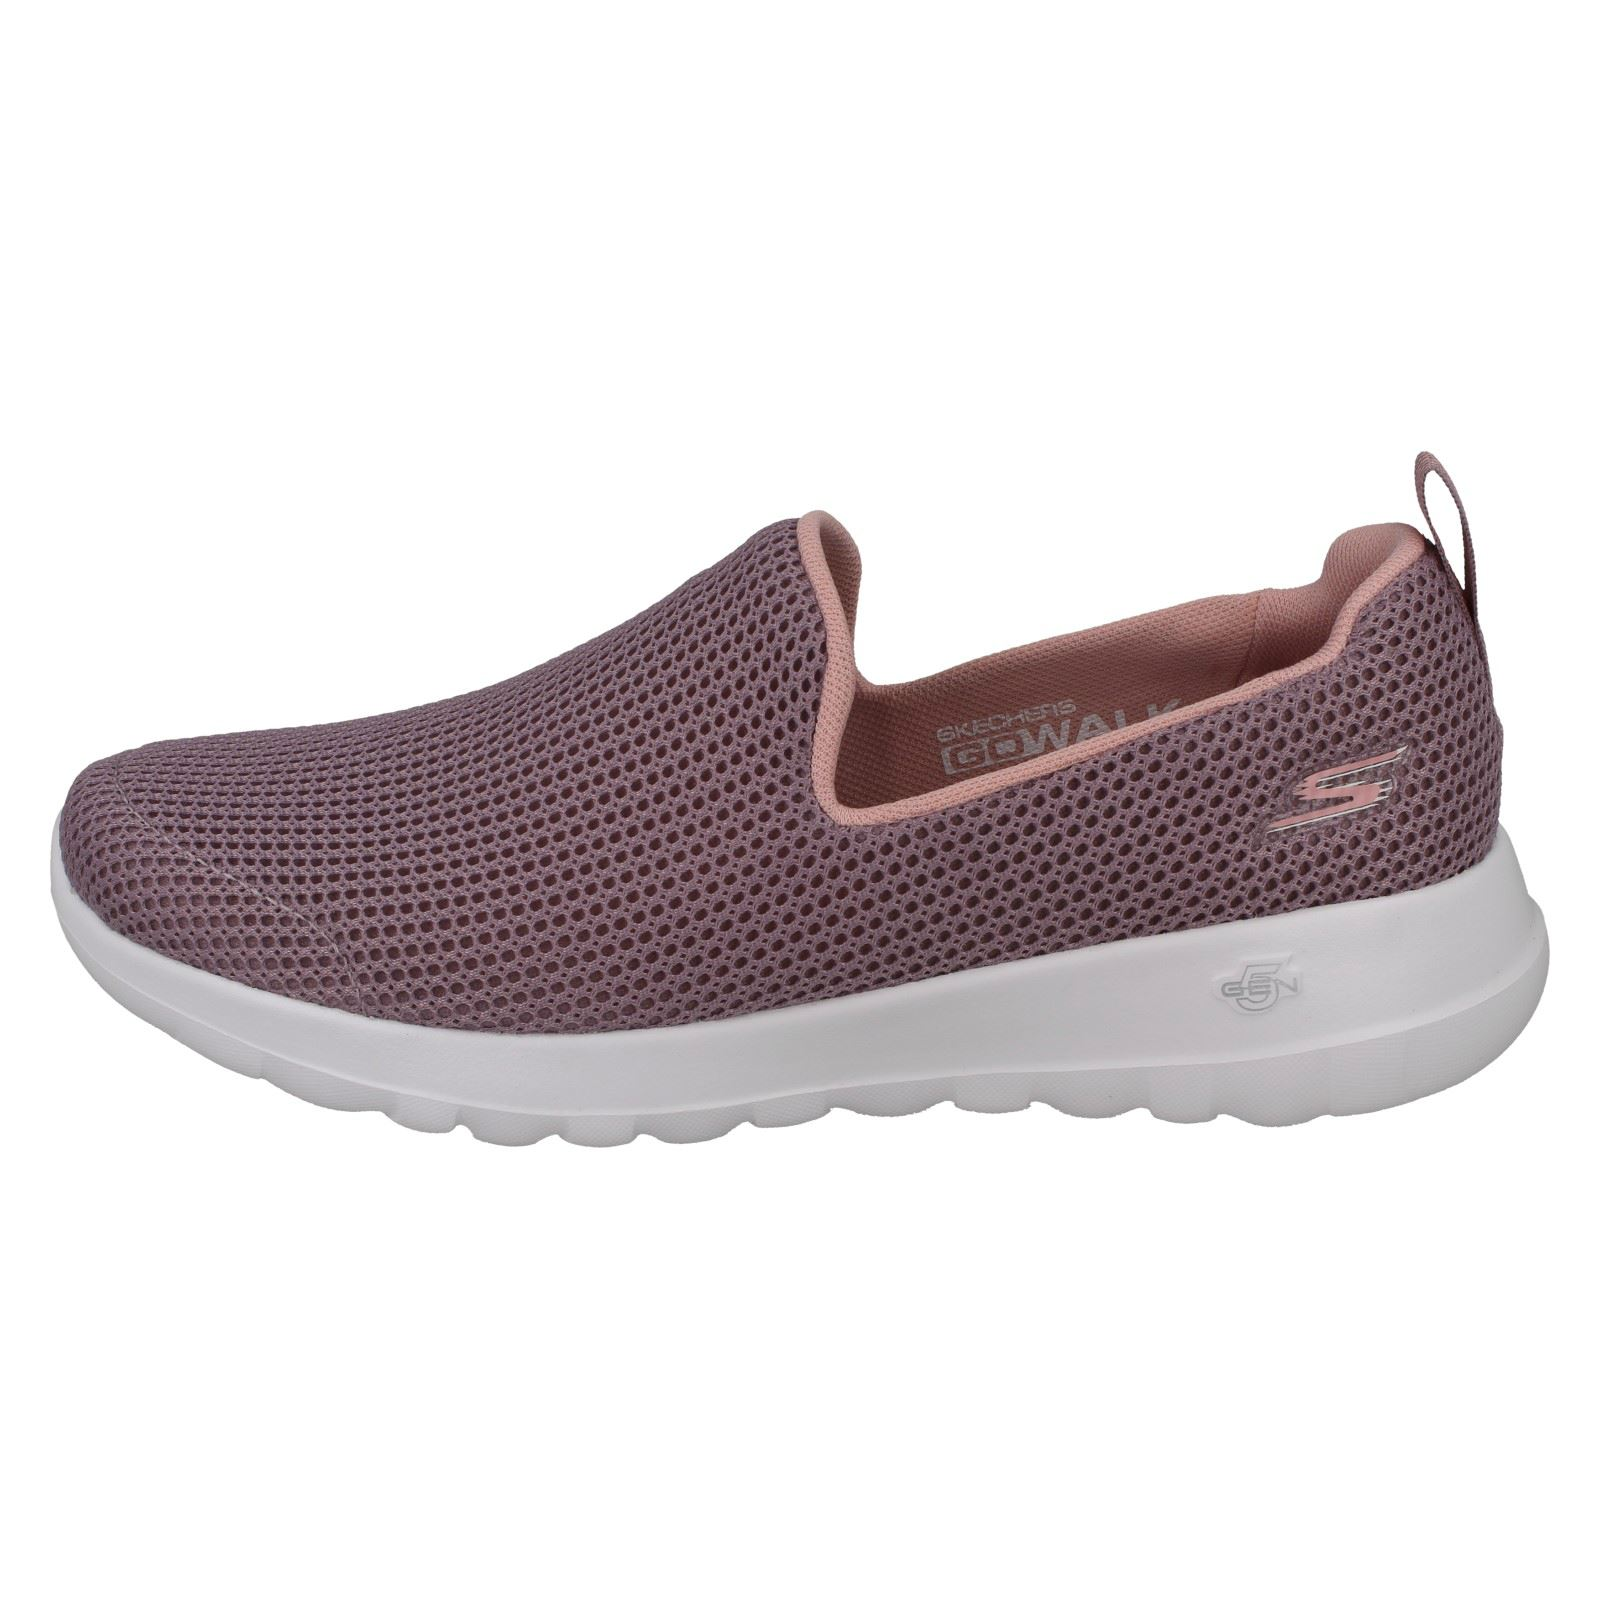 Donna Skechers Go Walk Da Scarpe Casual-Centrossoavola Casual-Centrossoavola Casual-Centrossoavola 01e61a